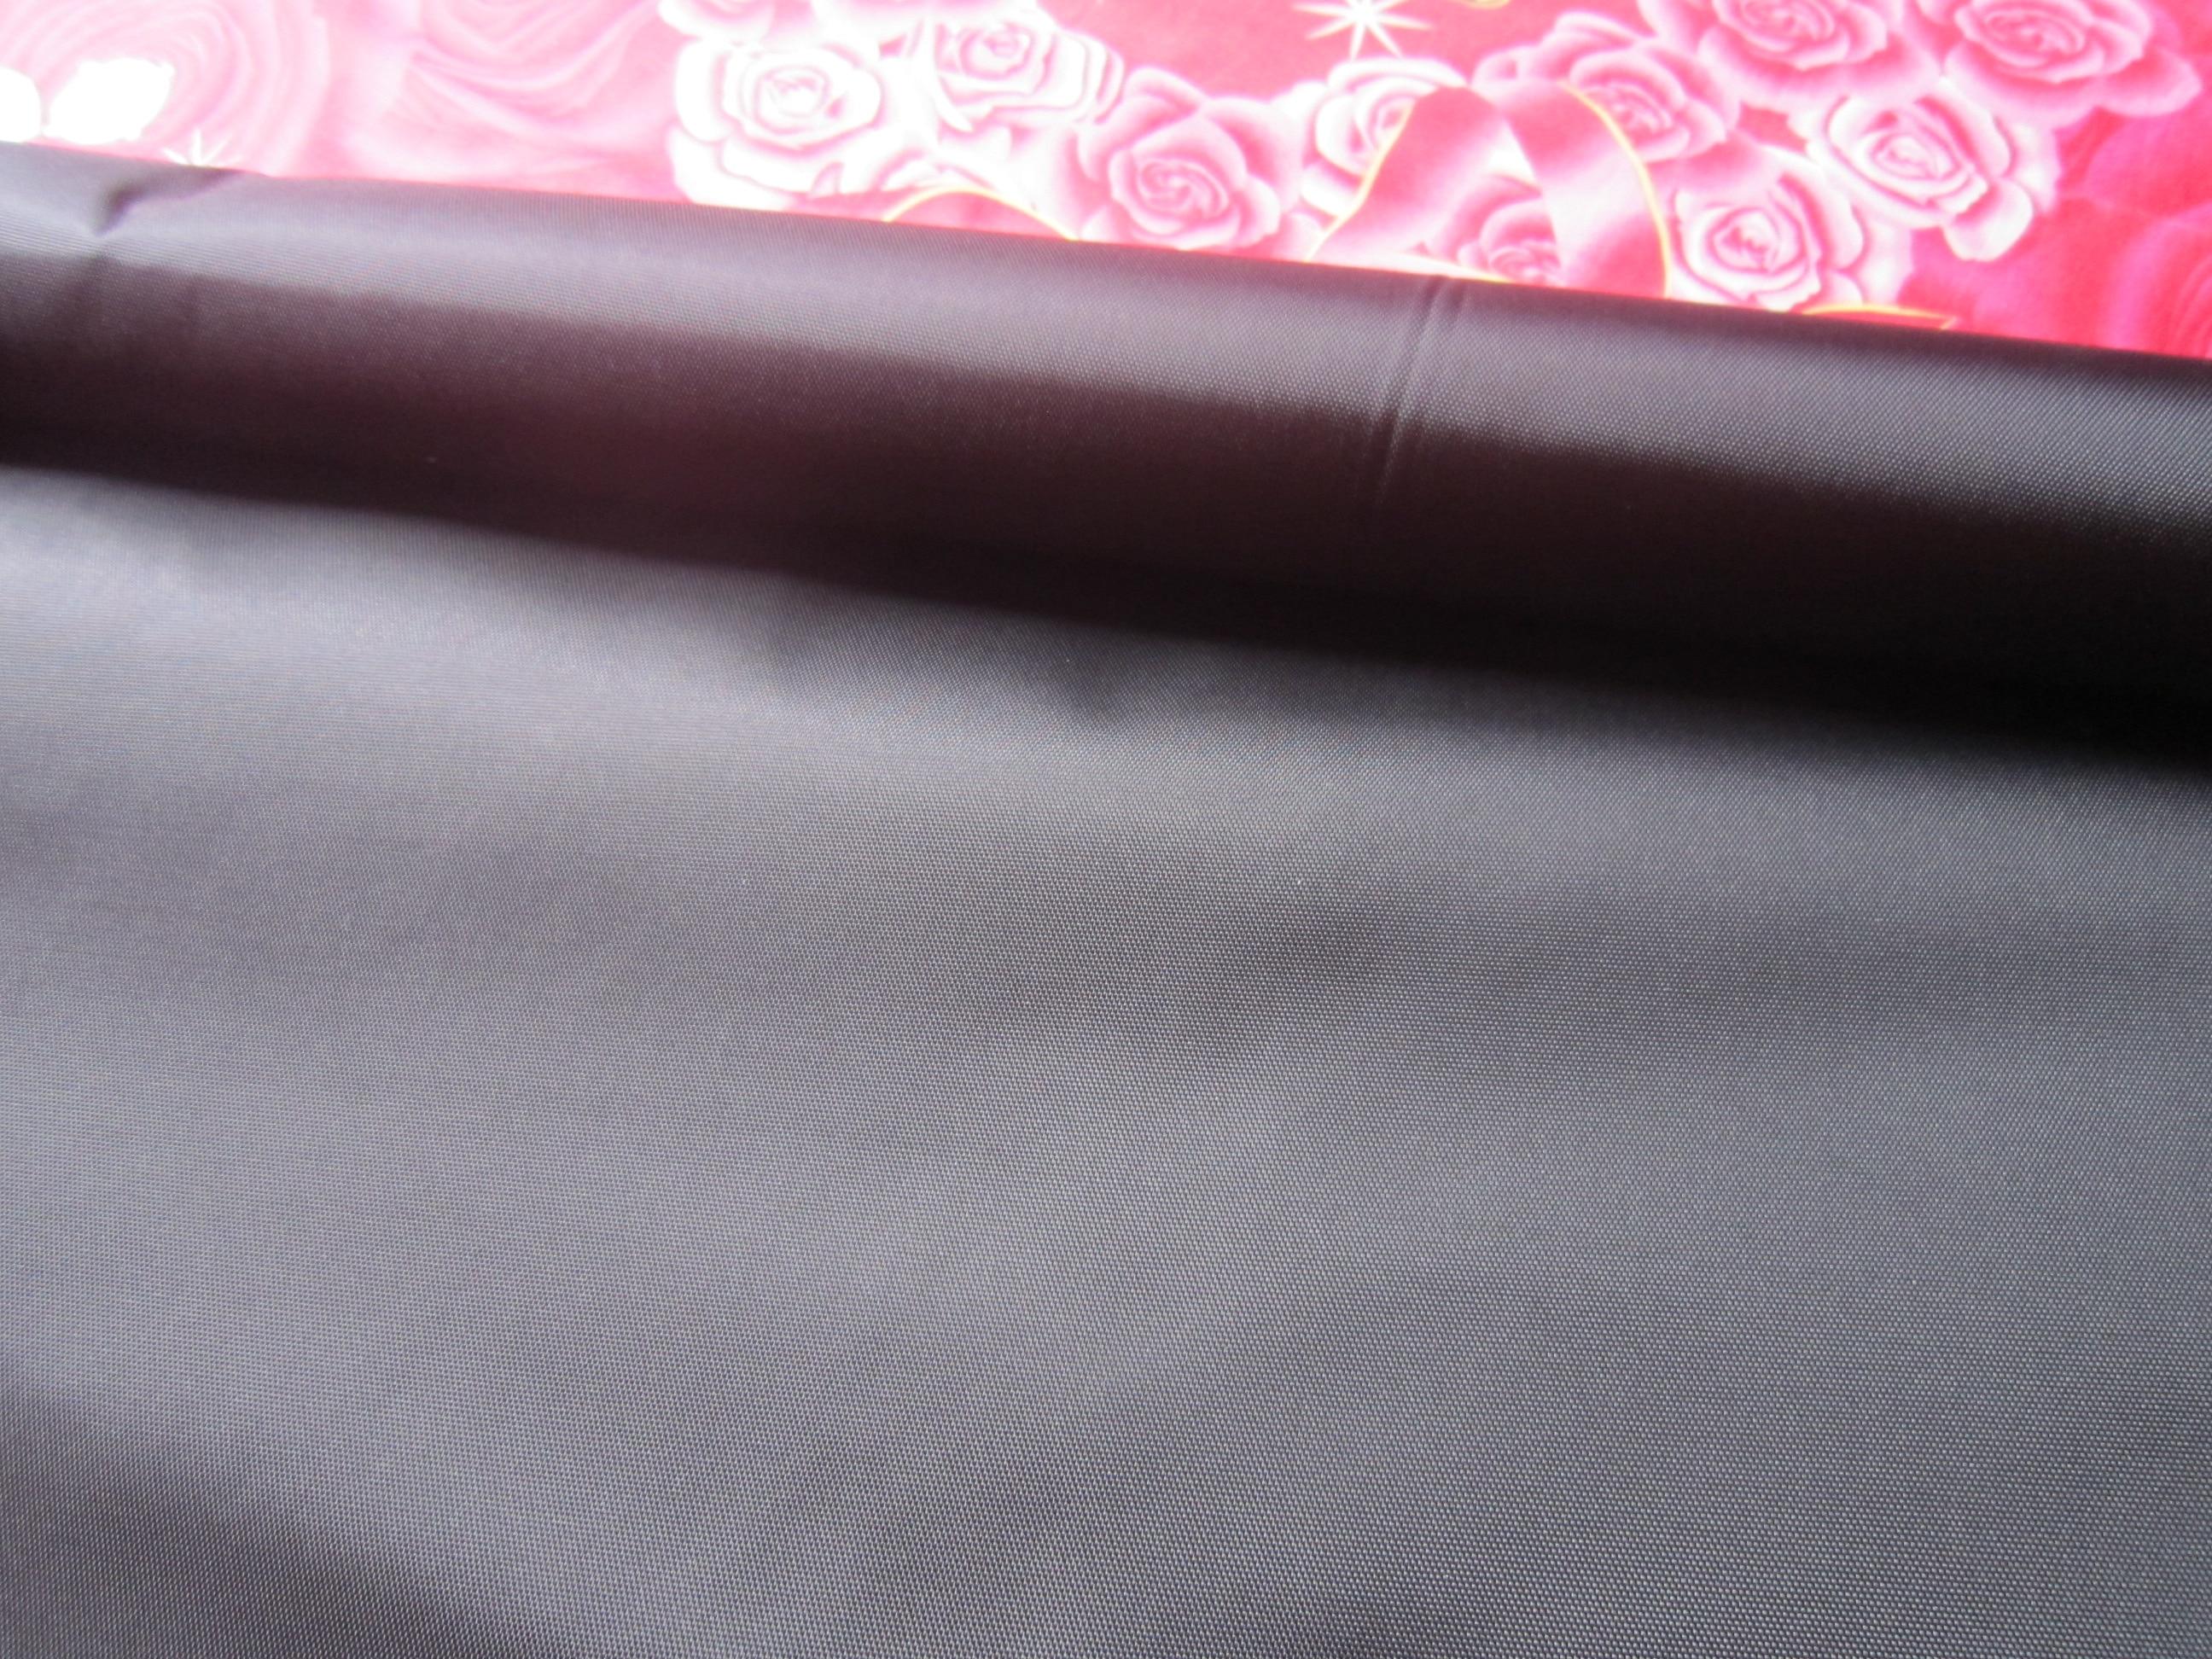 odolný materiál sáčku - Cheap 1000D PU coating Oxford fabric, luggage, sports bag fabric, wear-resistant, strong material.black cloth.